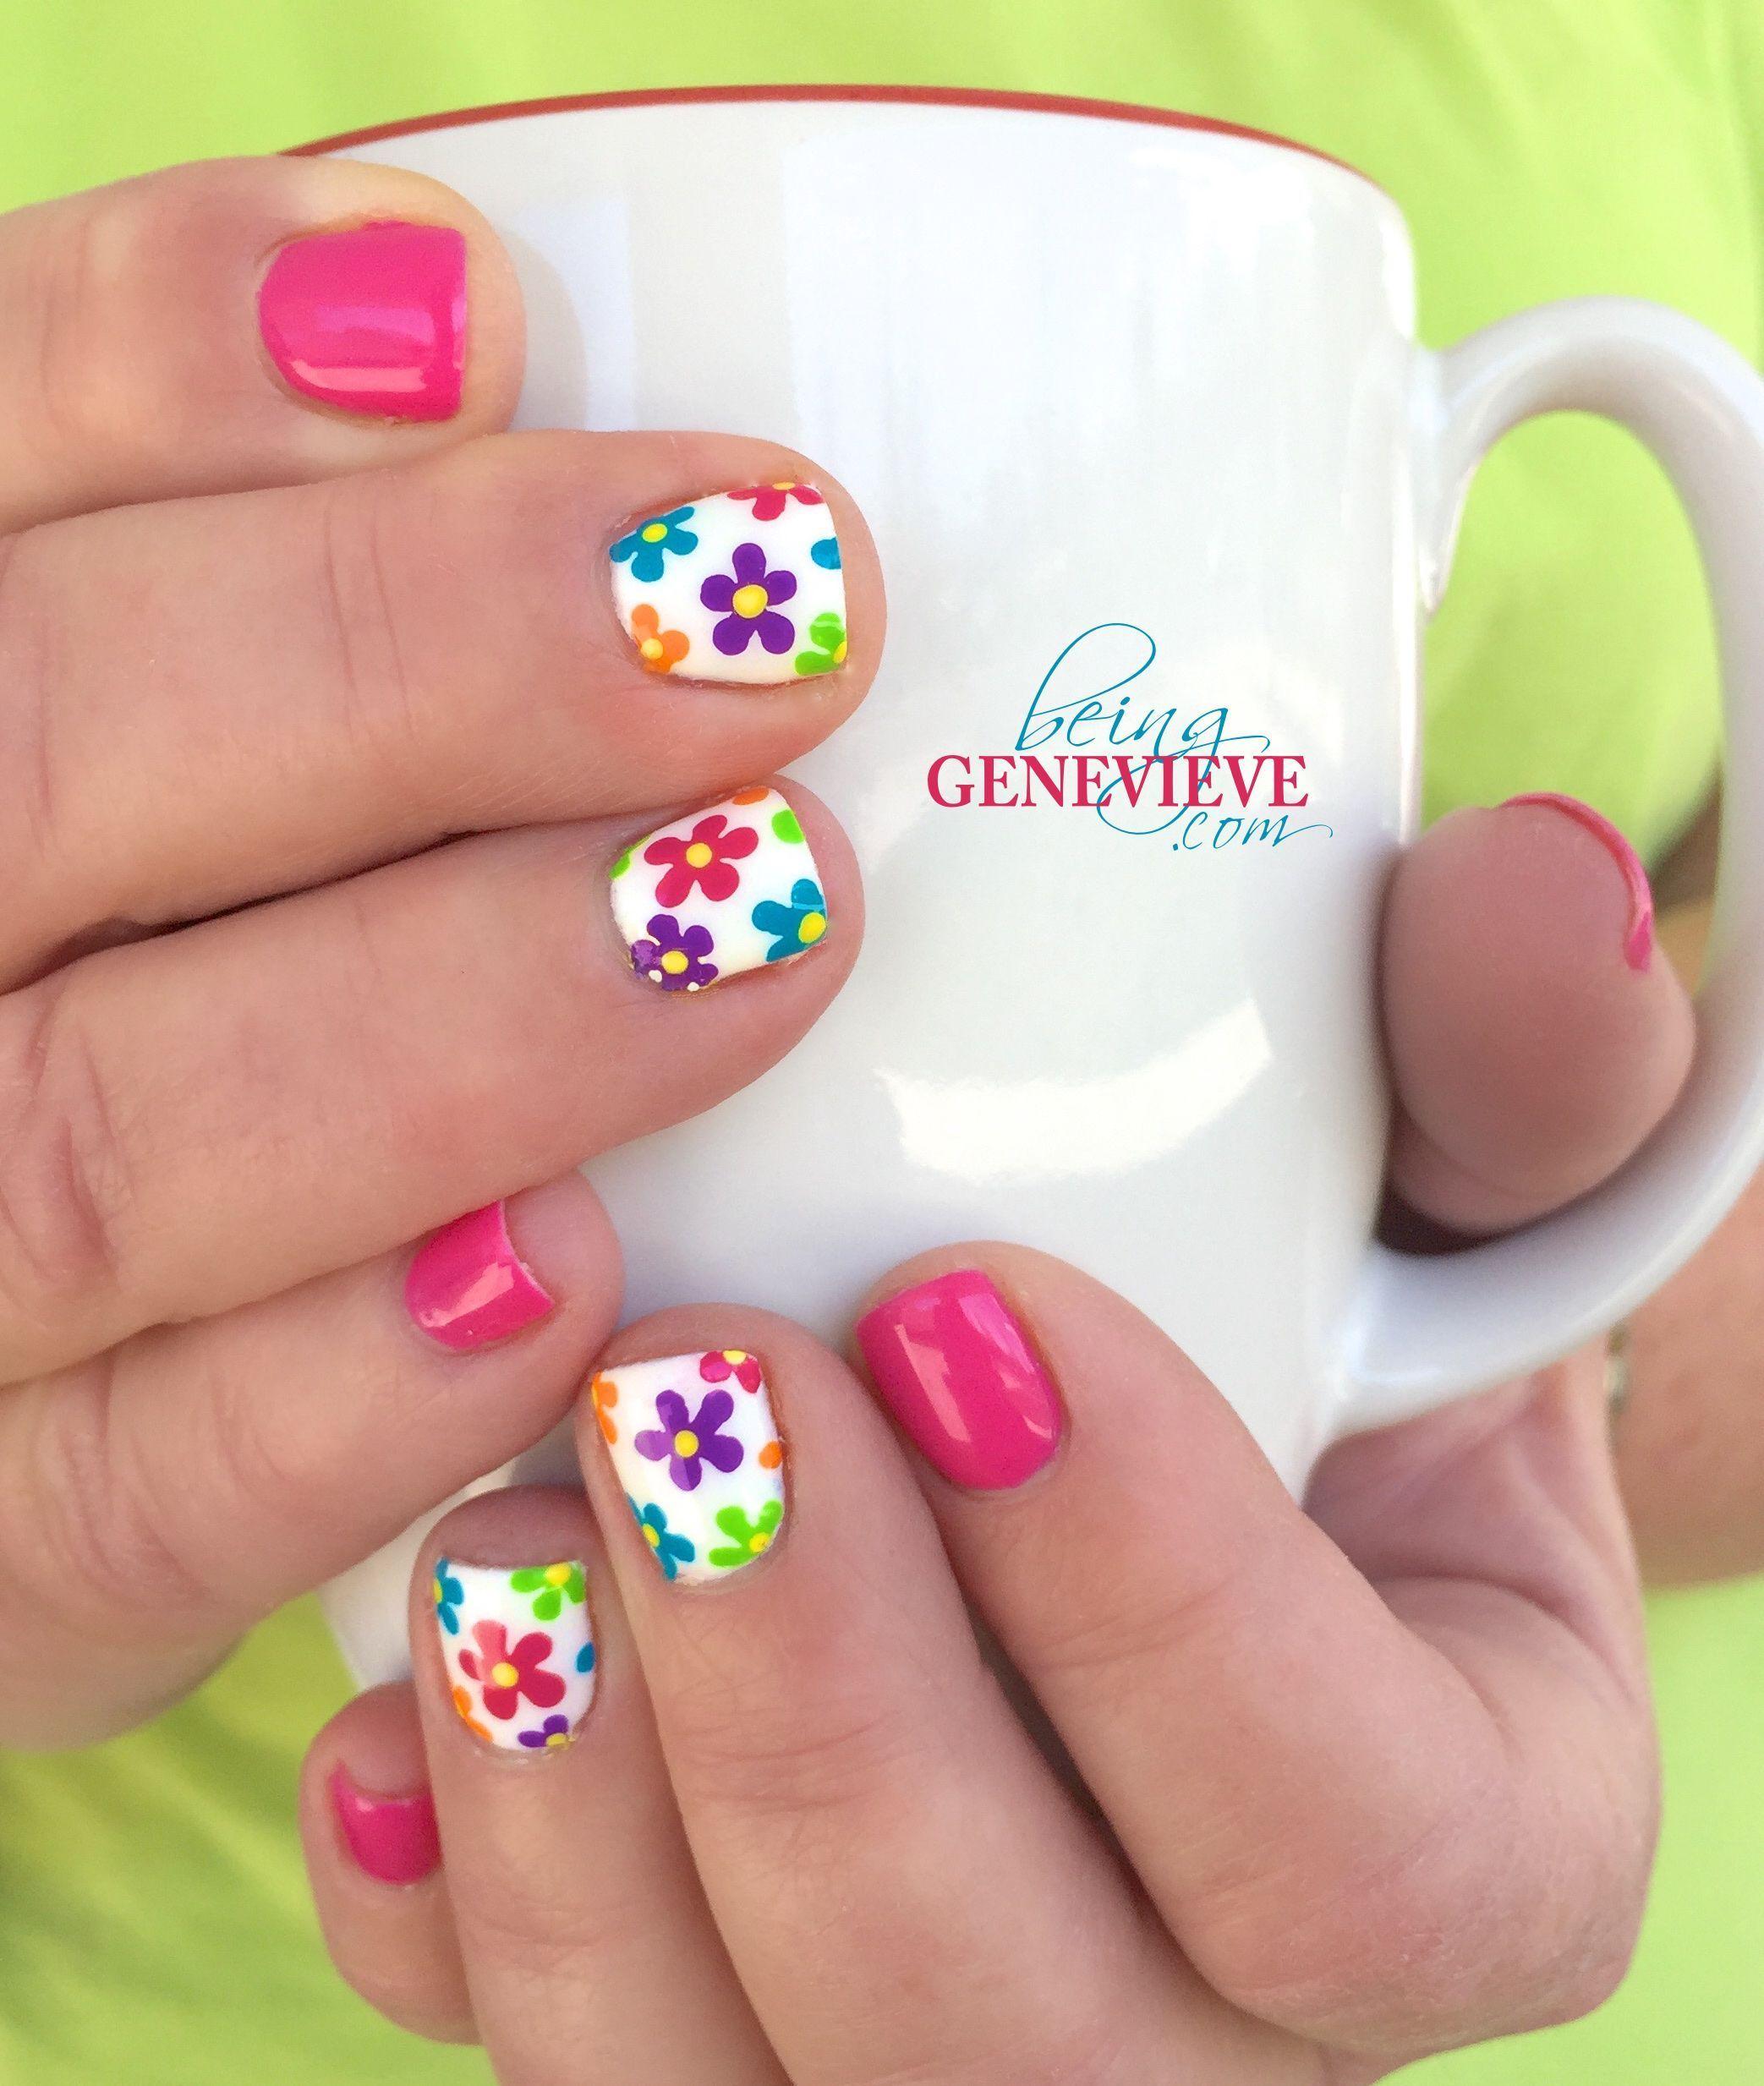 80+ beautiful colorful nail design ideas for spring nails 2018 – nagel-design-bilder.de